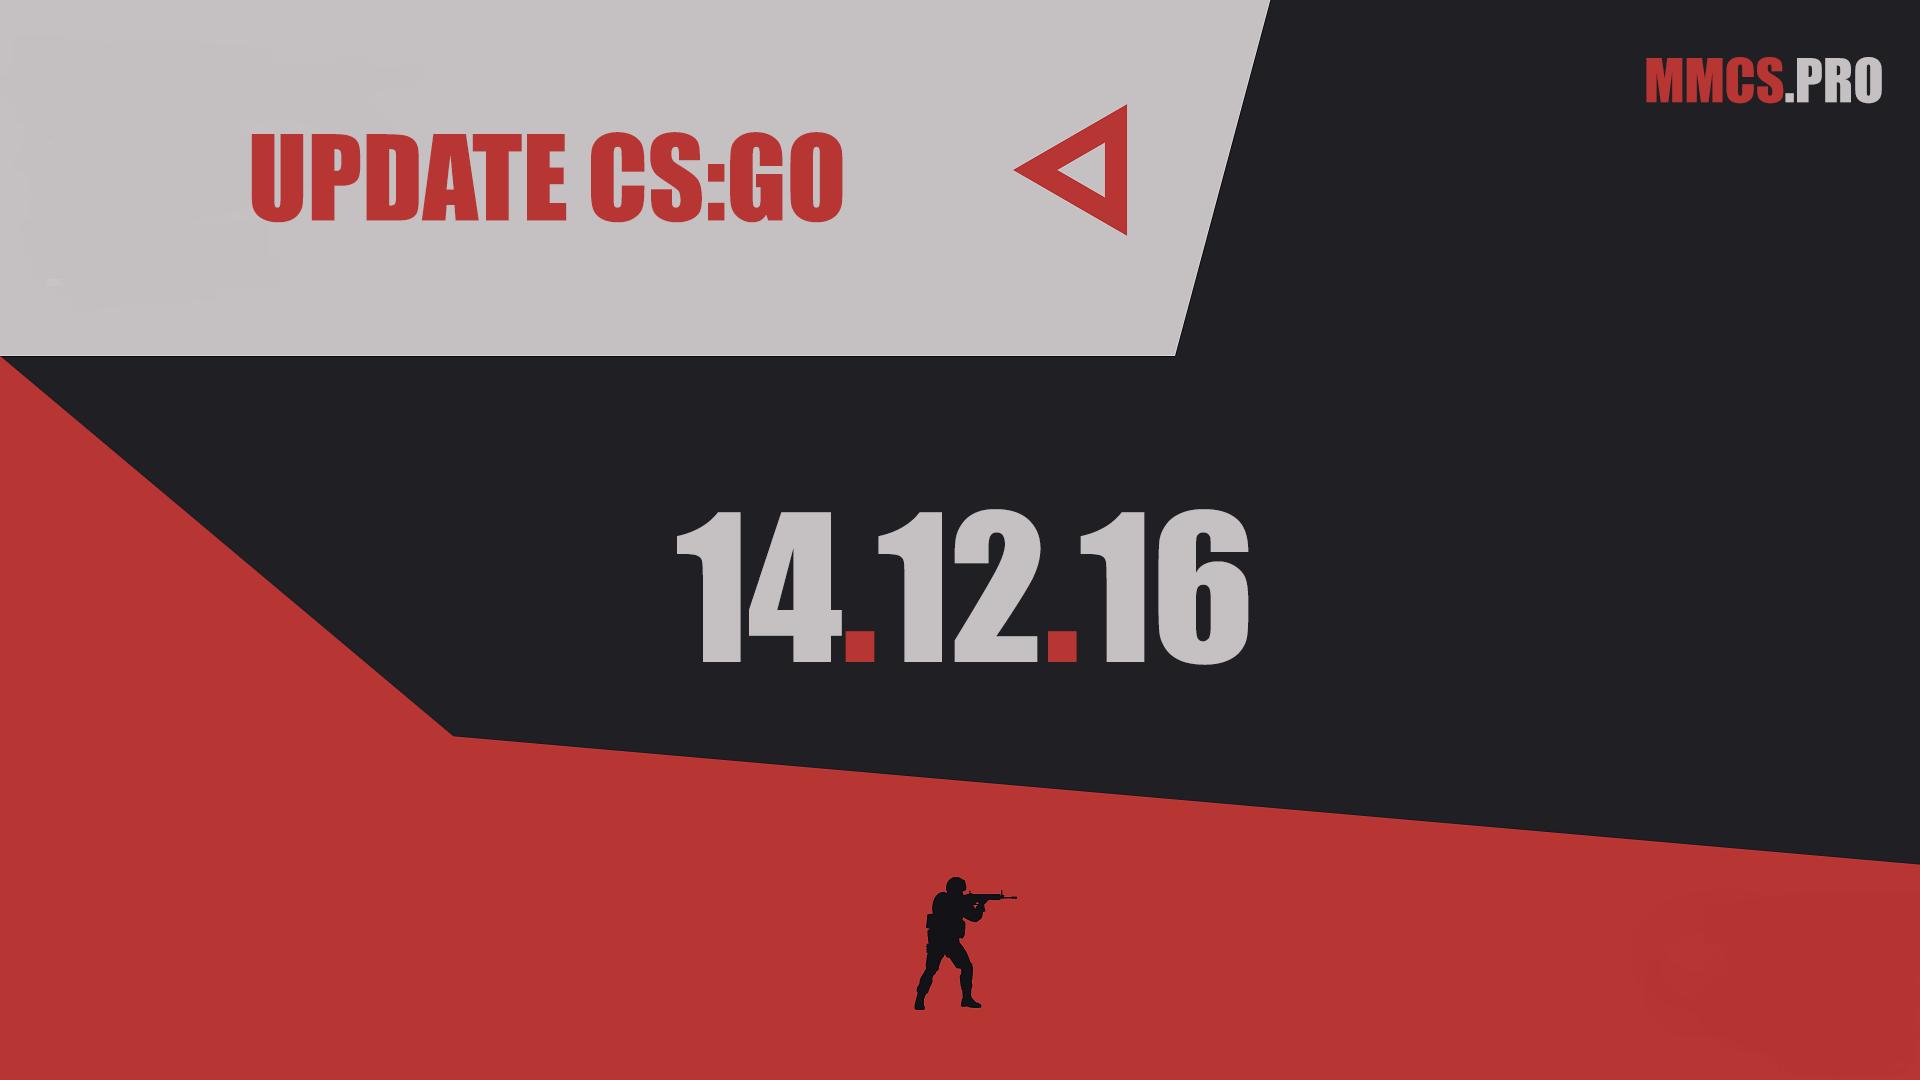 https://mmcs.pro/update-csgo-14-12-2016-valve/